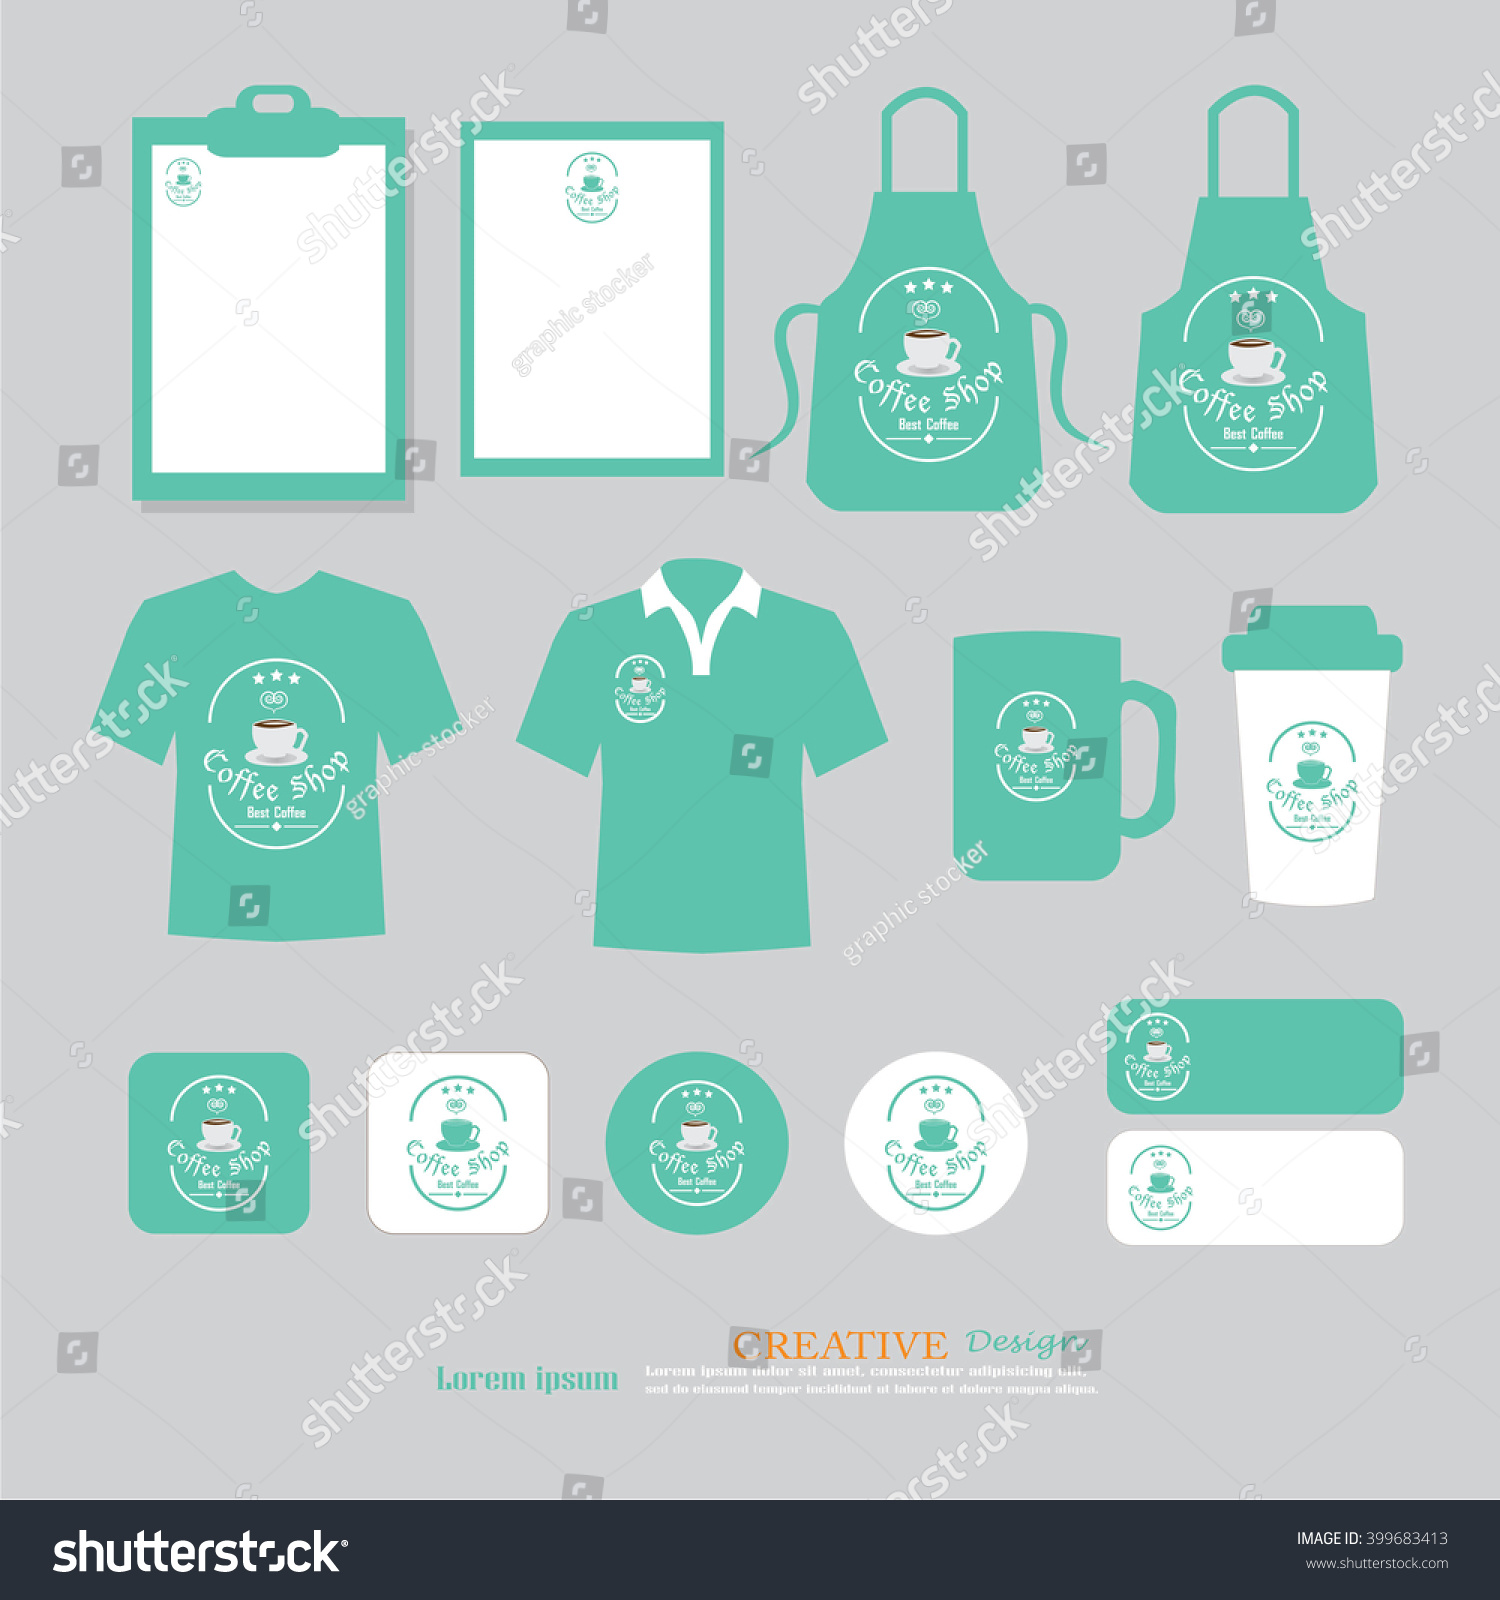 Shirt uniform design vector - Vector Restaurant Cafe Set Flyer Menu Package T Shirt Uniform Design